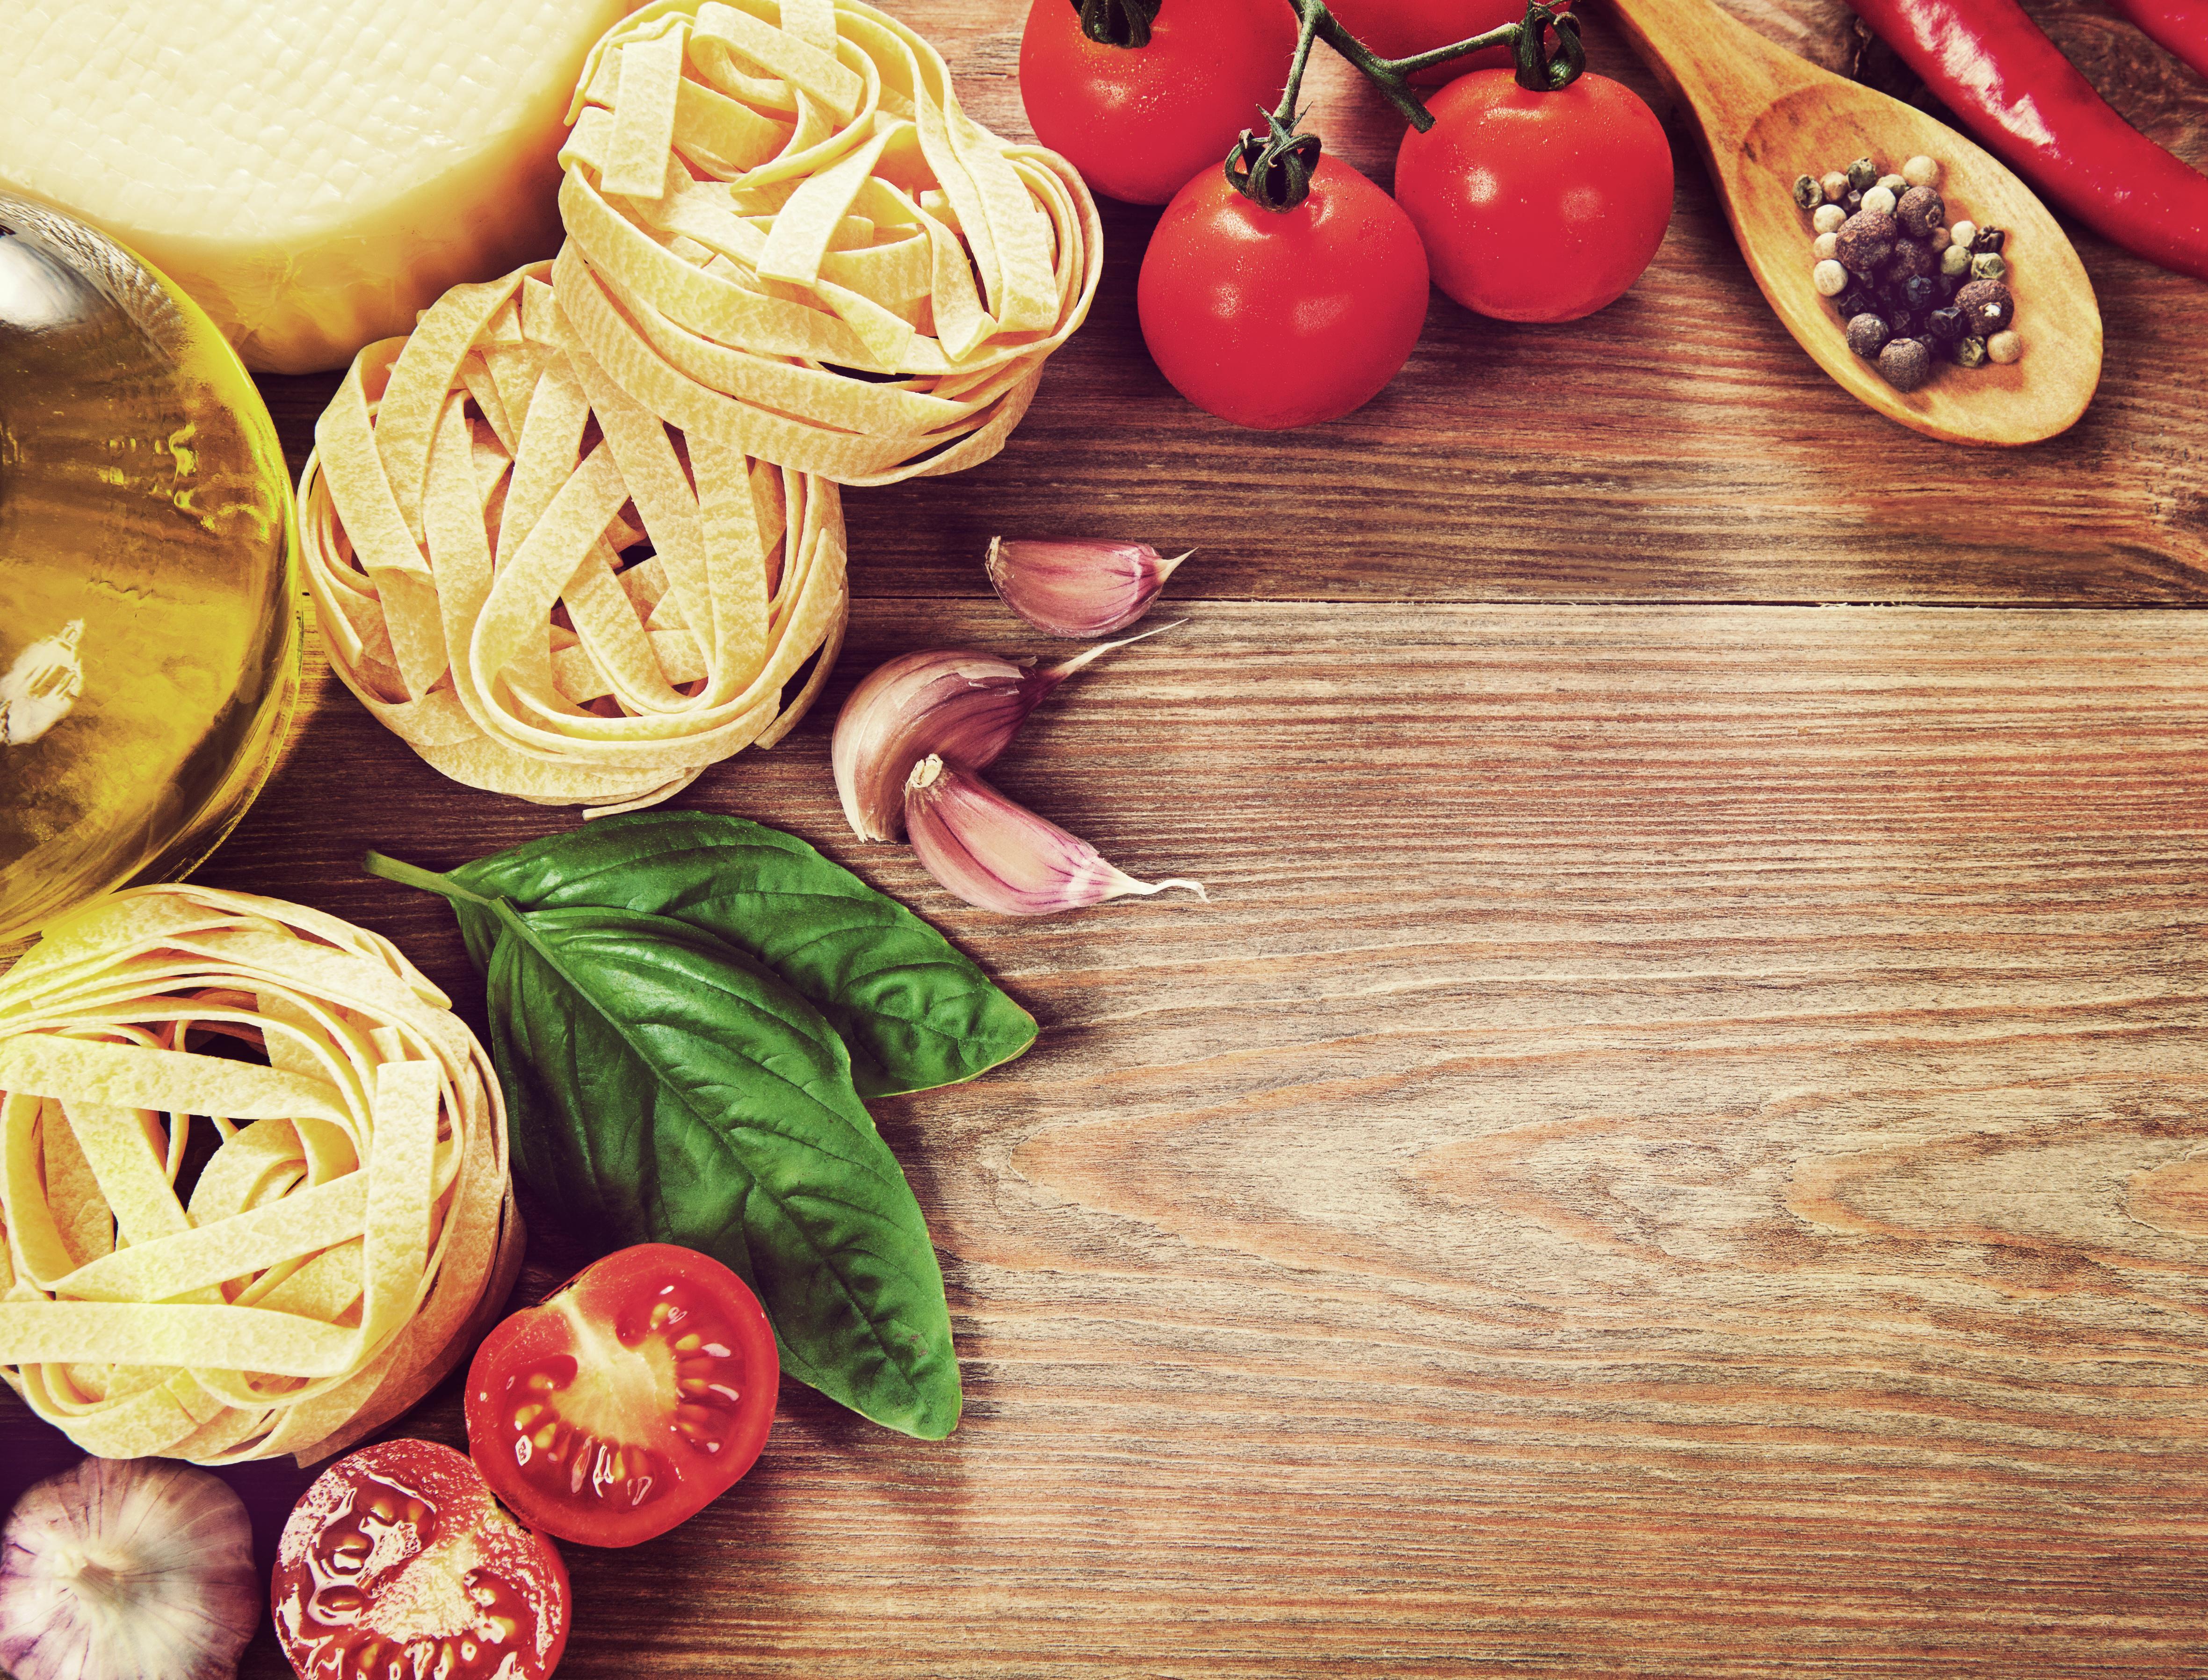 Bangle Food Decoration Vegetable Background  Holiday  Tomato  Meal Background Image for Free